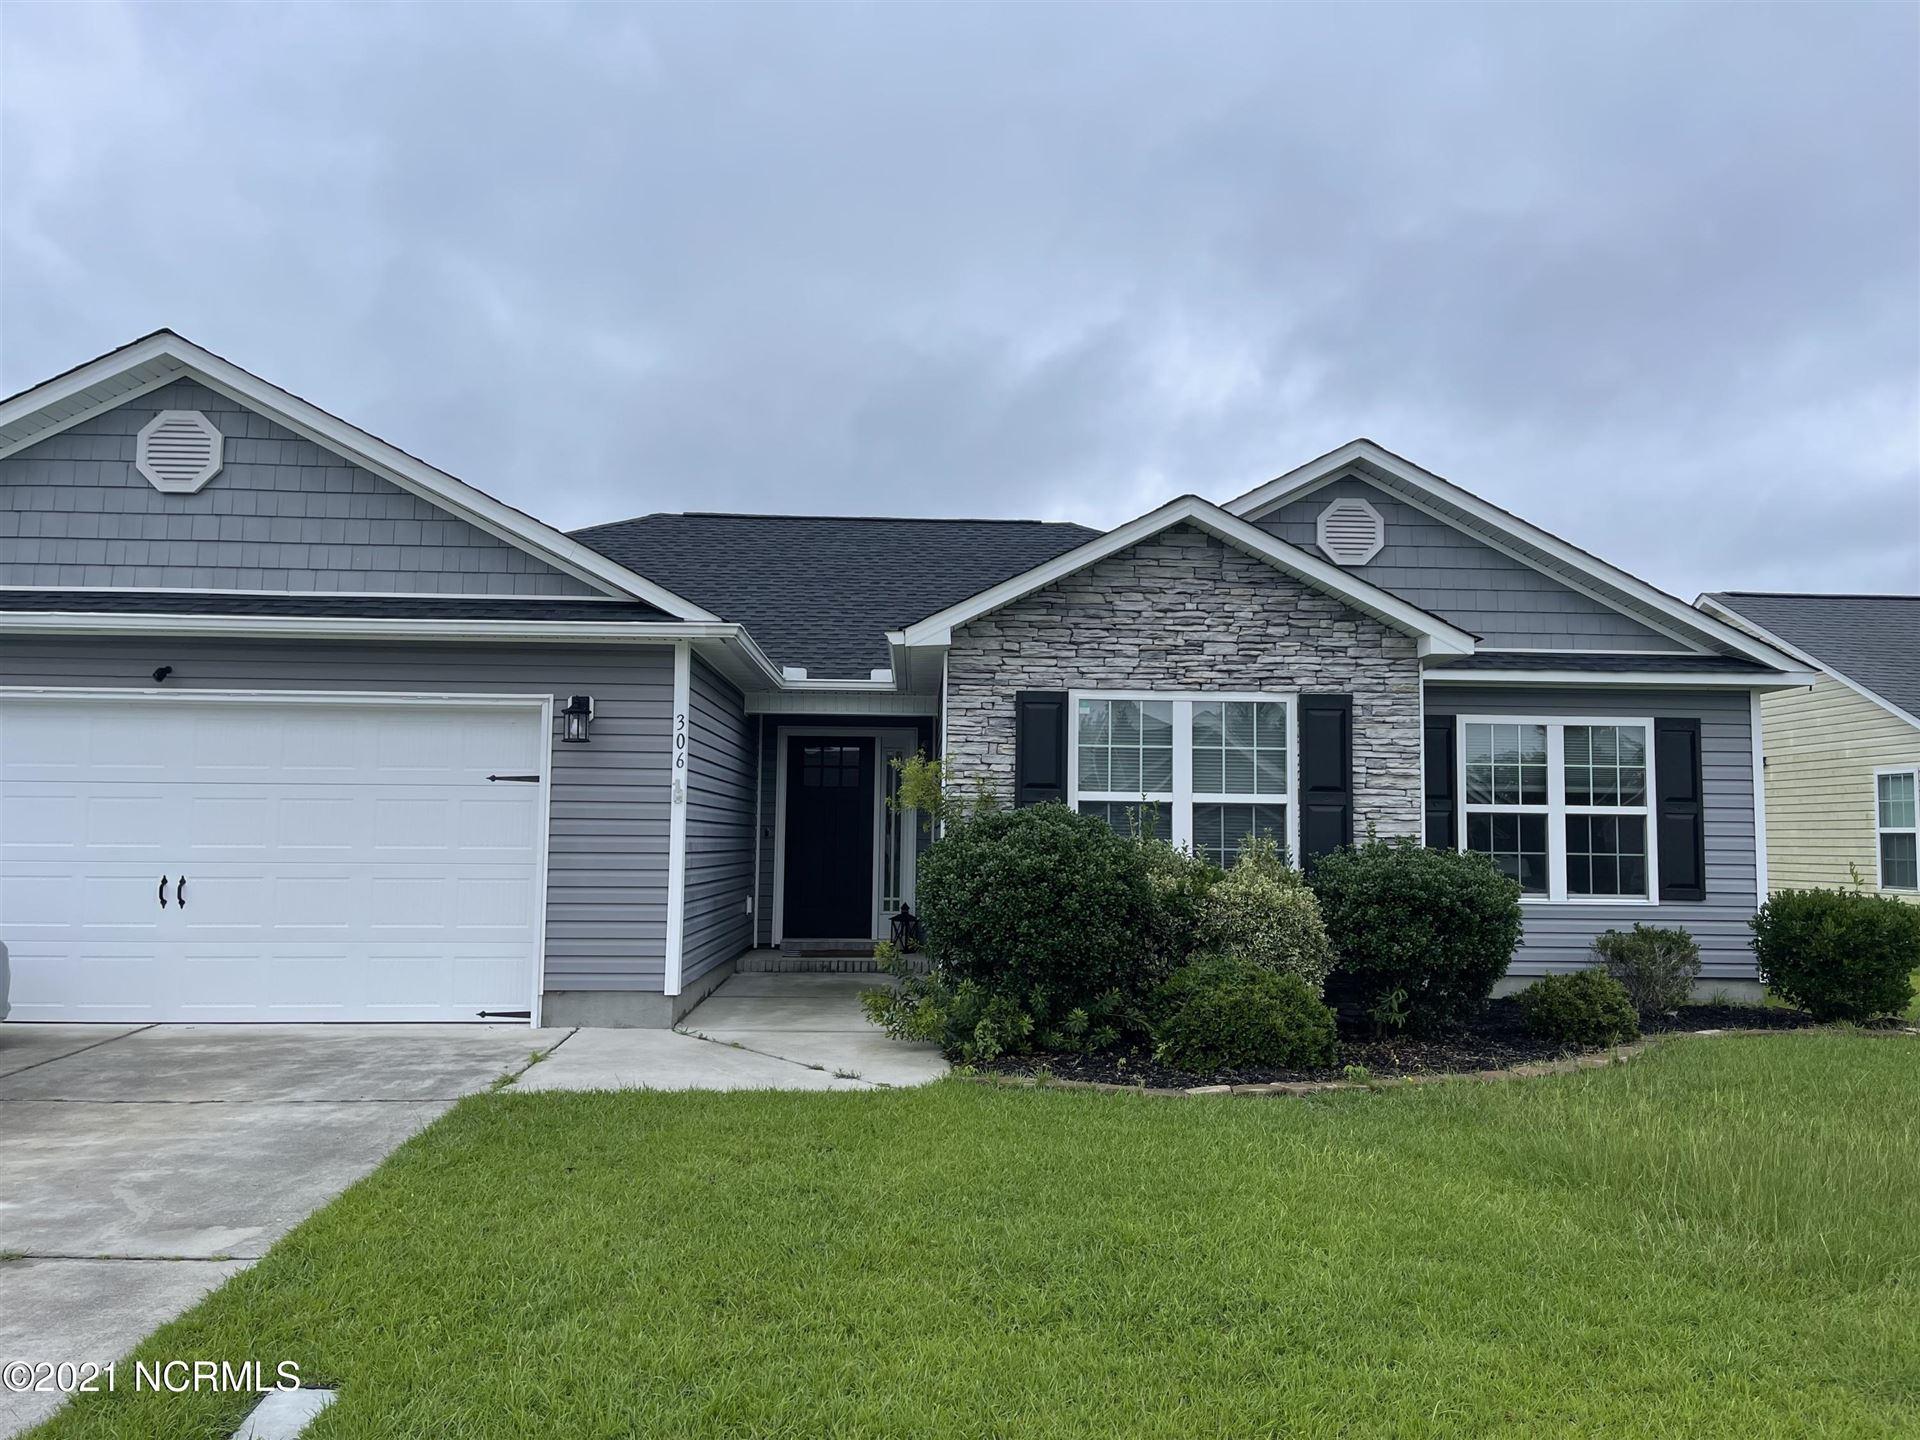 Photo of 306 Kingston Road, Jacksonville, NC 28546 (MLS # 100287419)